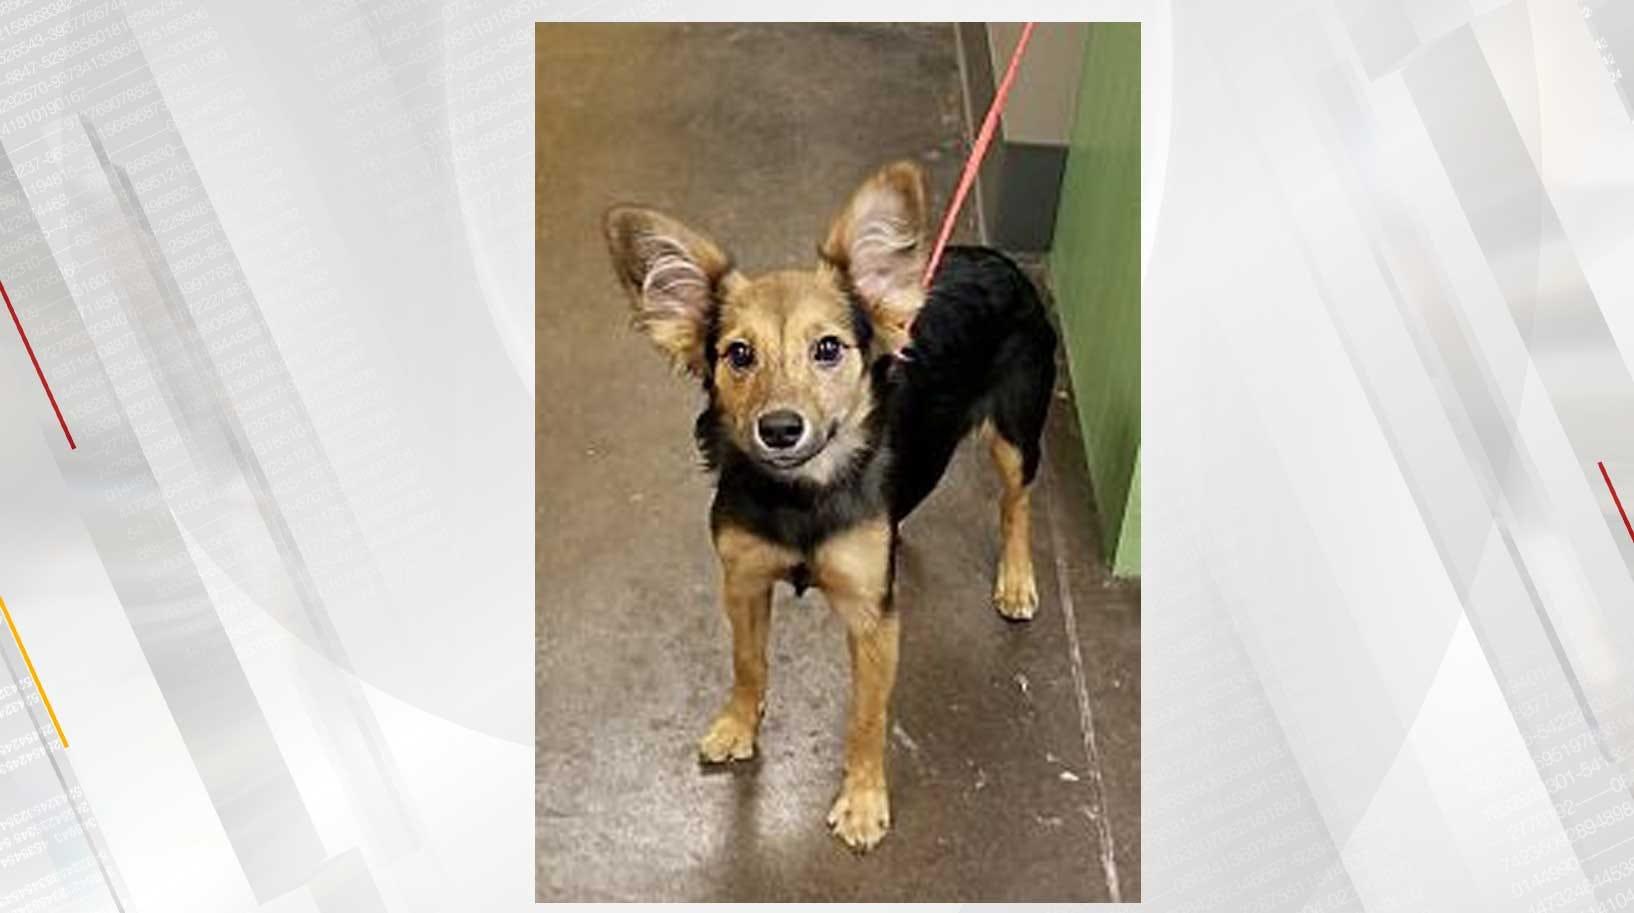 Norman Animal Welfare Holds 2-Week Long Adoption Event